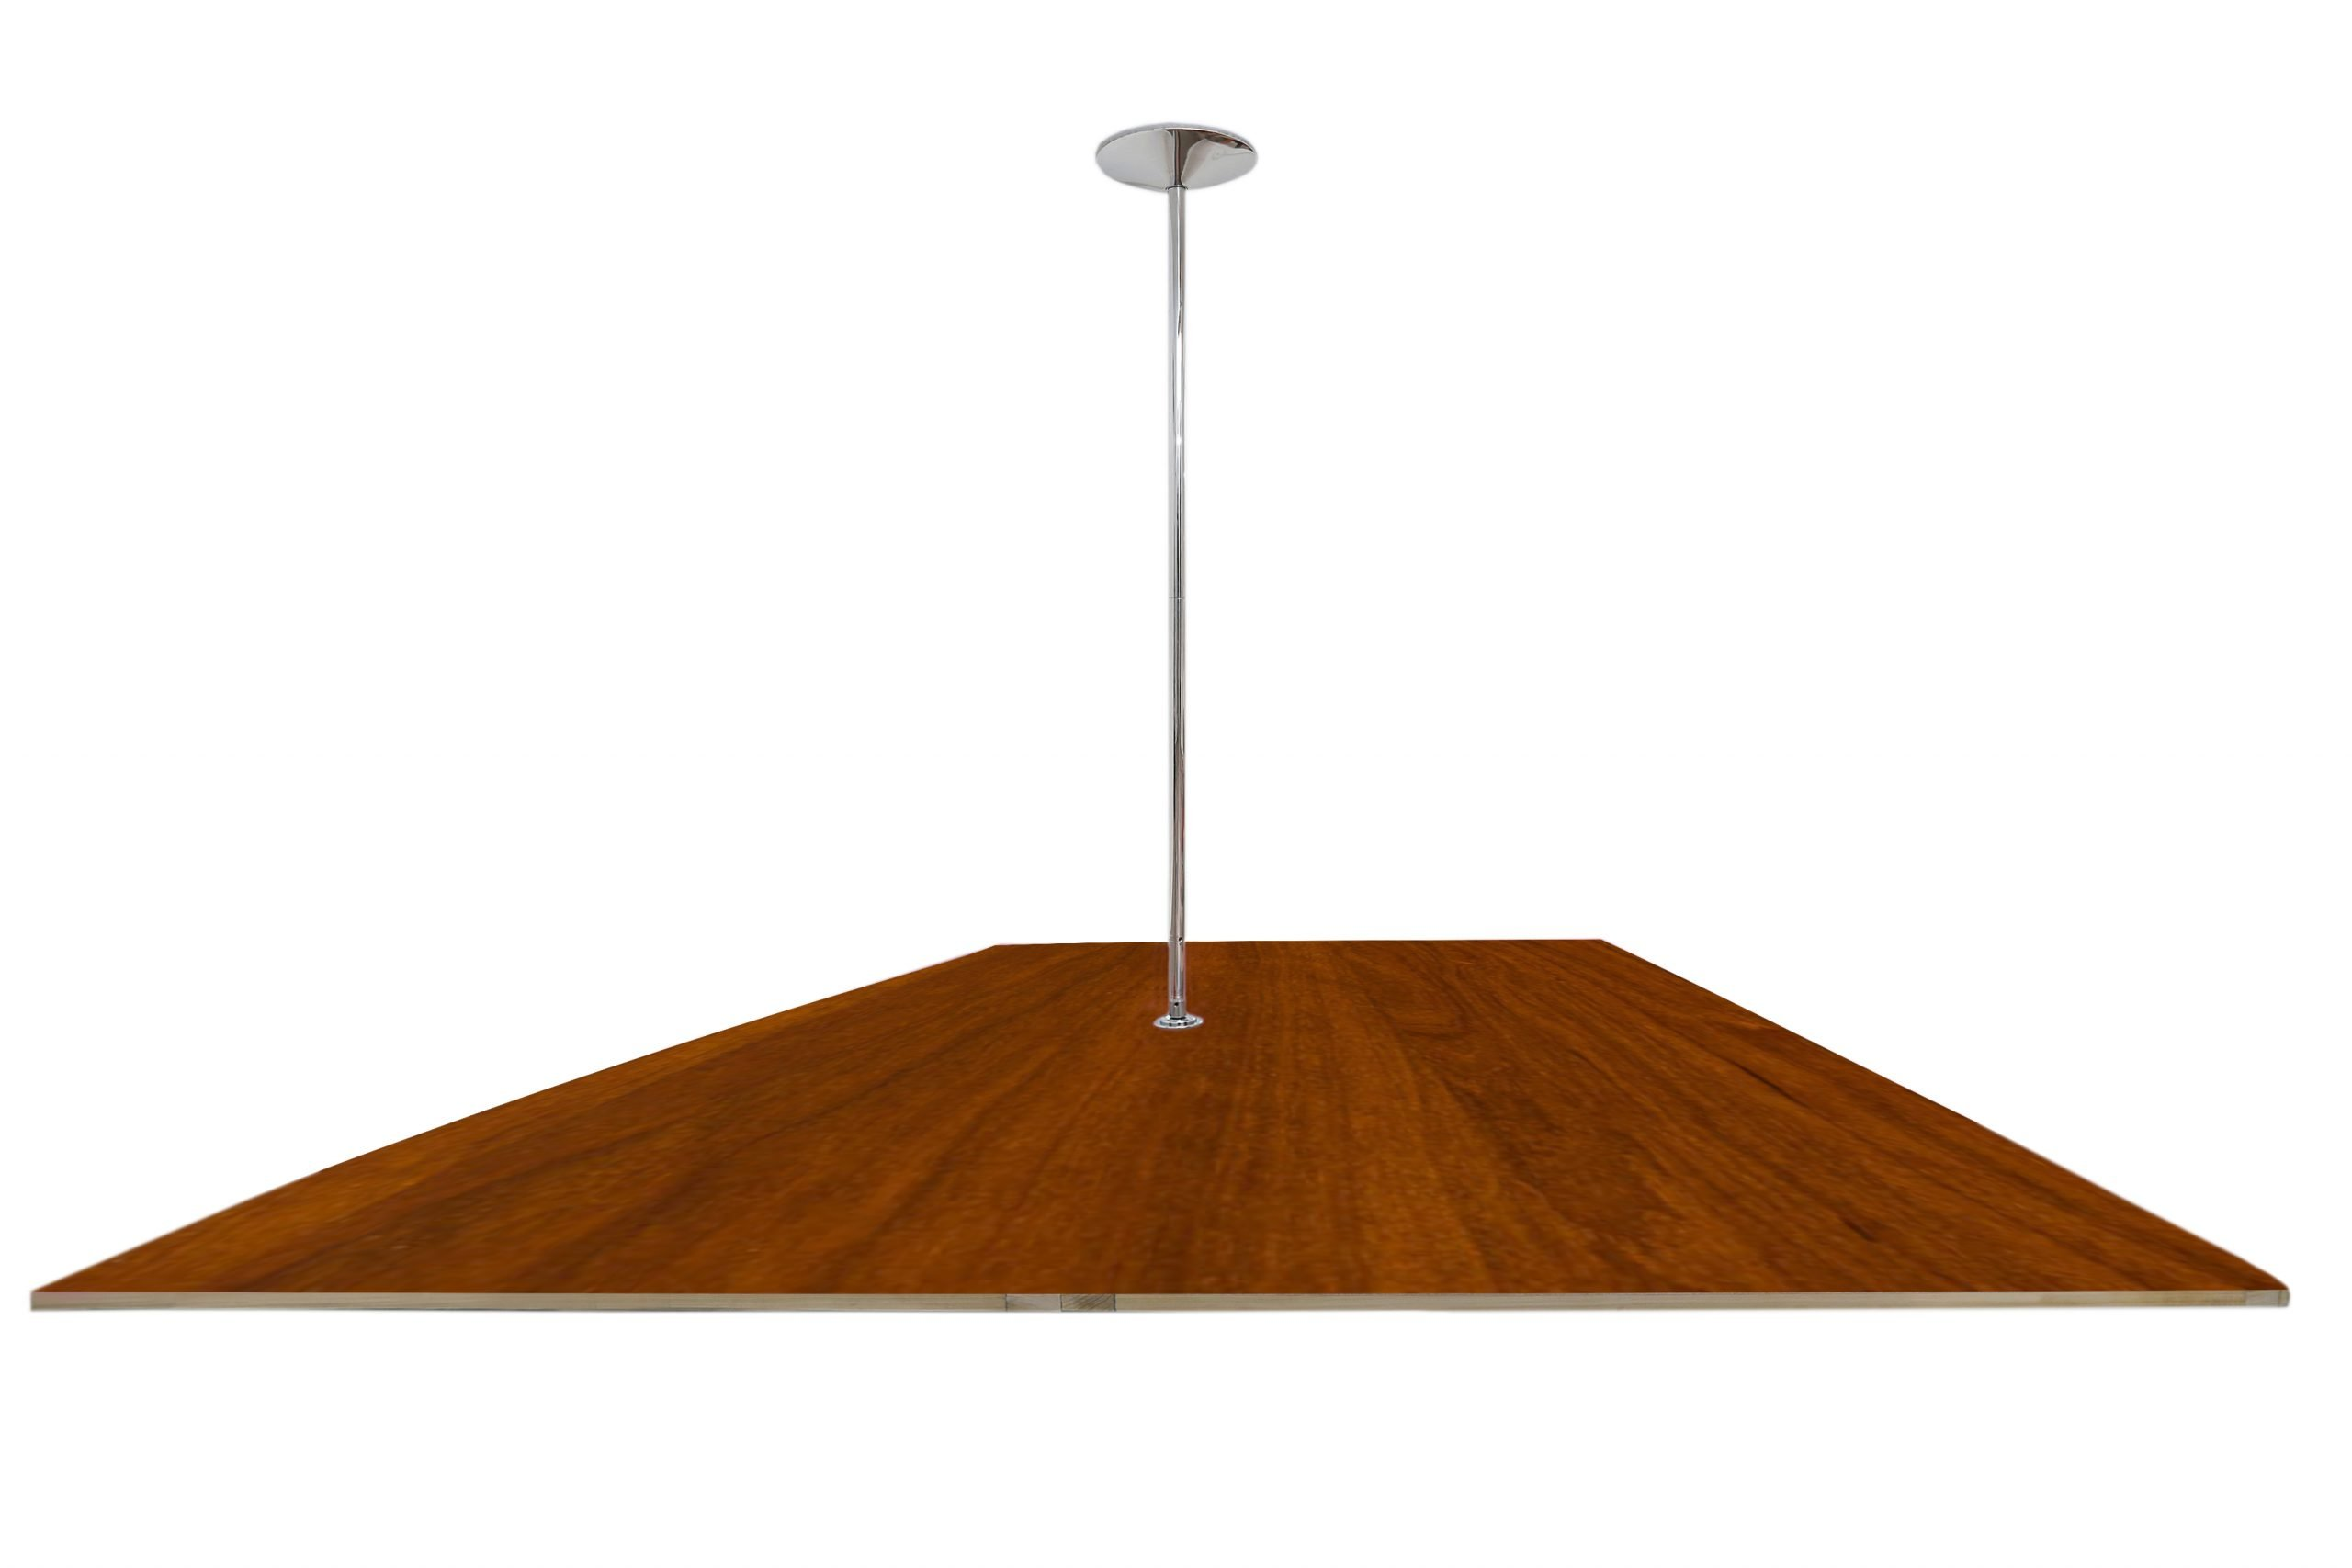 Pole Dance Floor Wood finish Rich Cherry